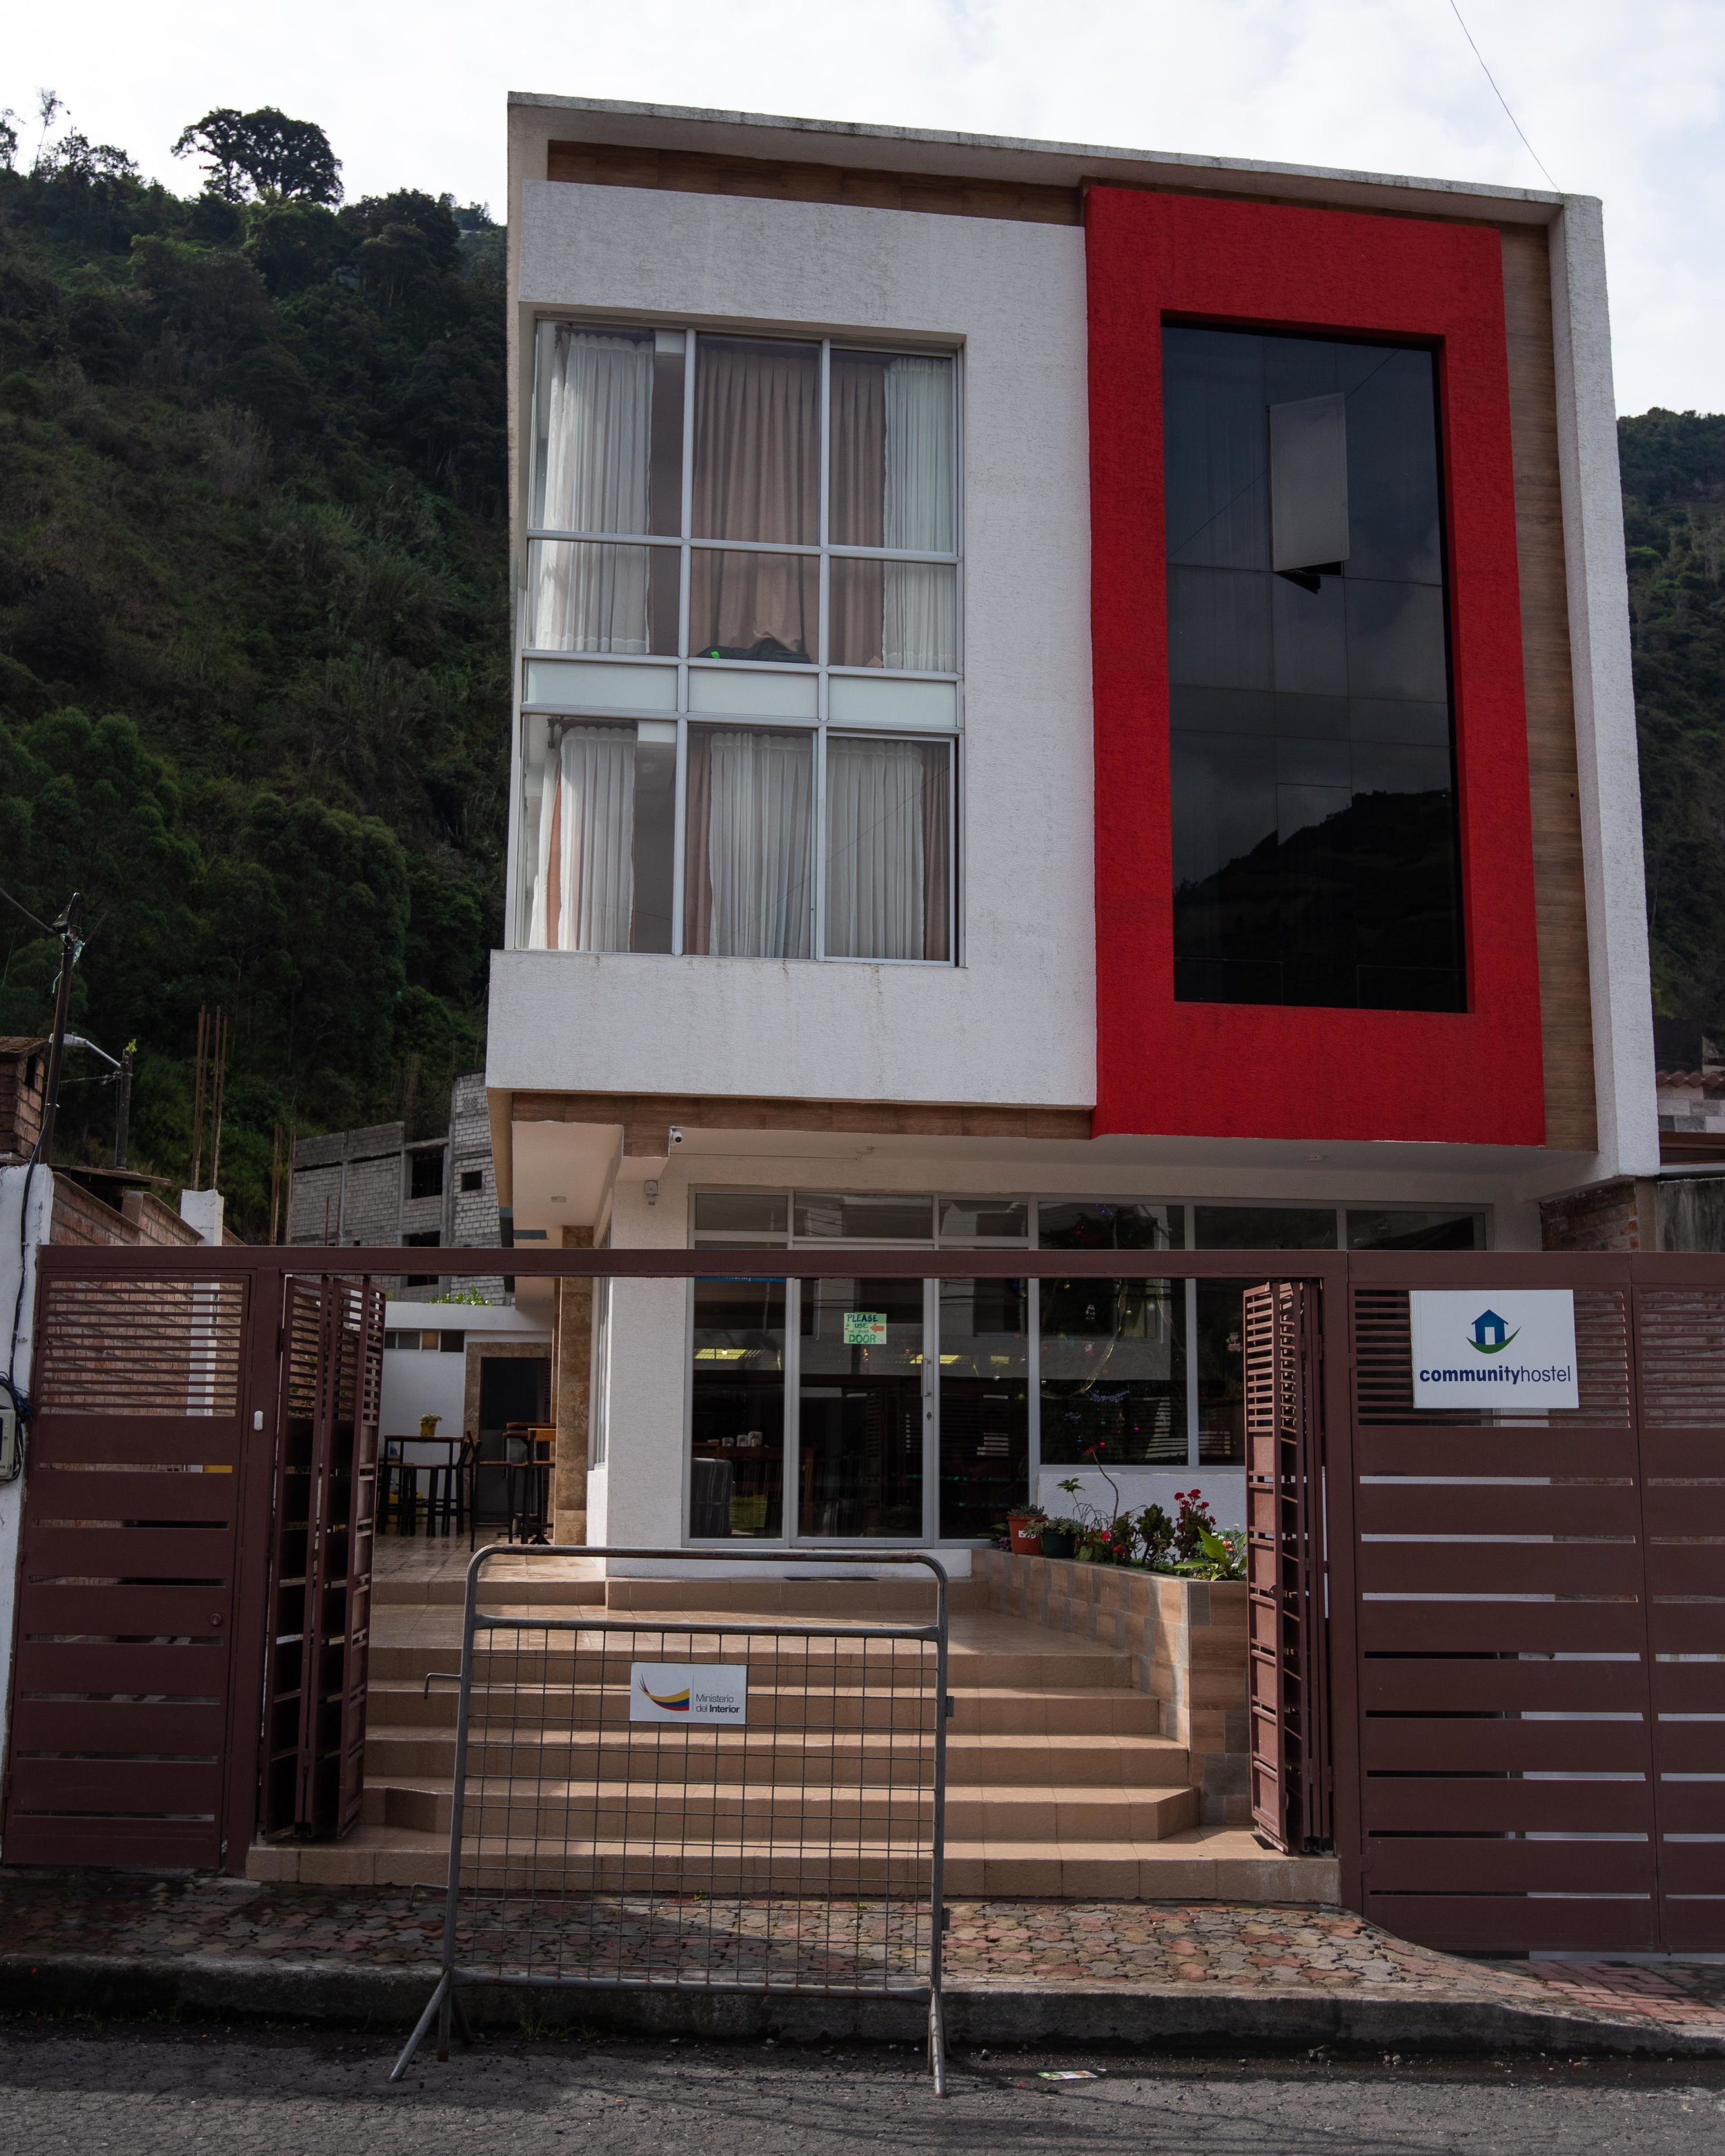 Community Hostel